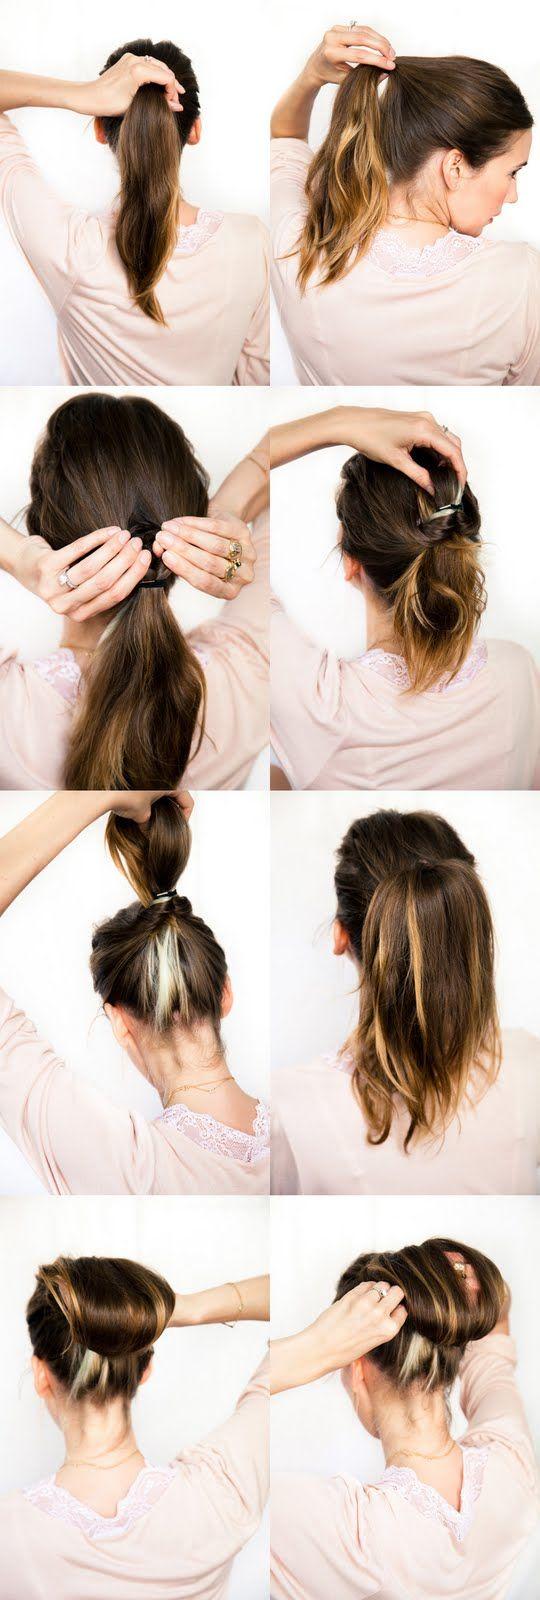 Love that hairstyle! And amazingly easy to do. Chestnut bun: Hair Tutorials, Wedding Hair, Diy Hair, Long Hair, Buns Tutorial, Hair Style, High Ponytail, Ponies Tail, Diy Wedding